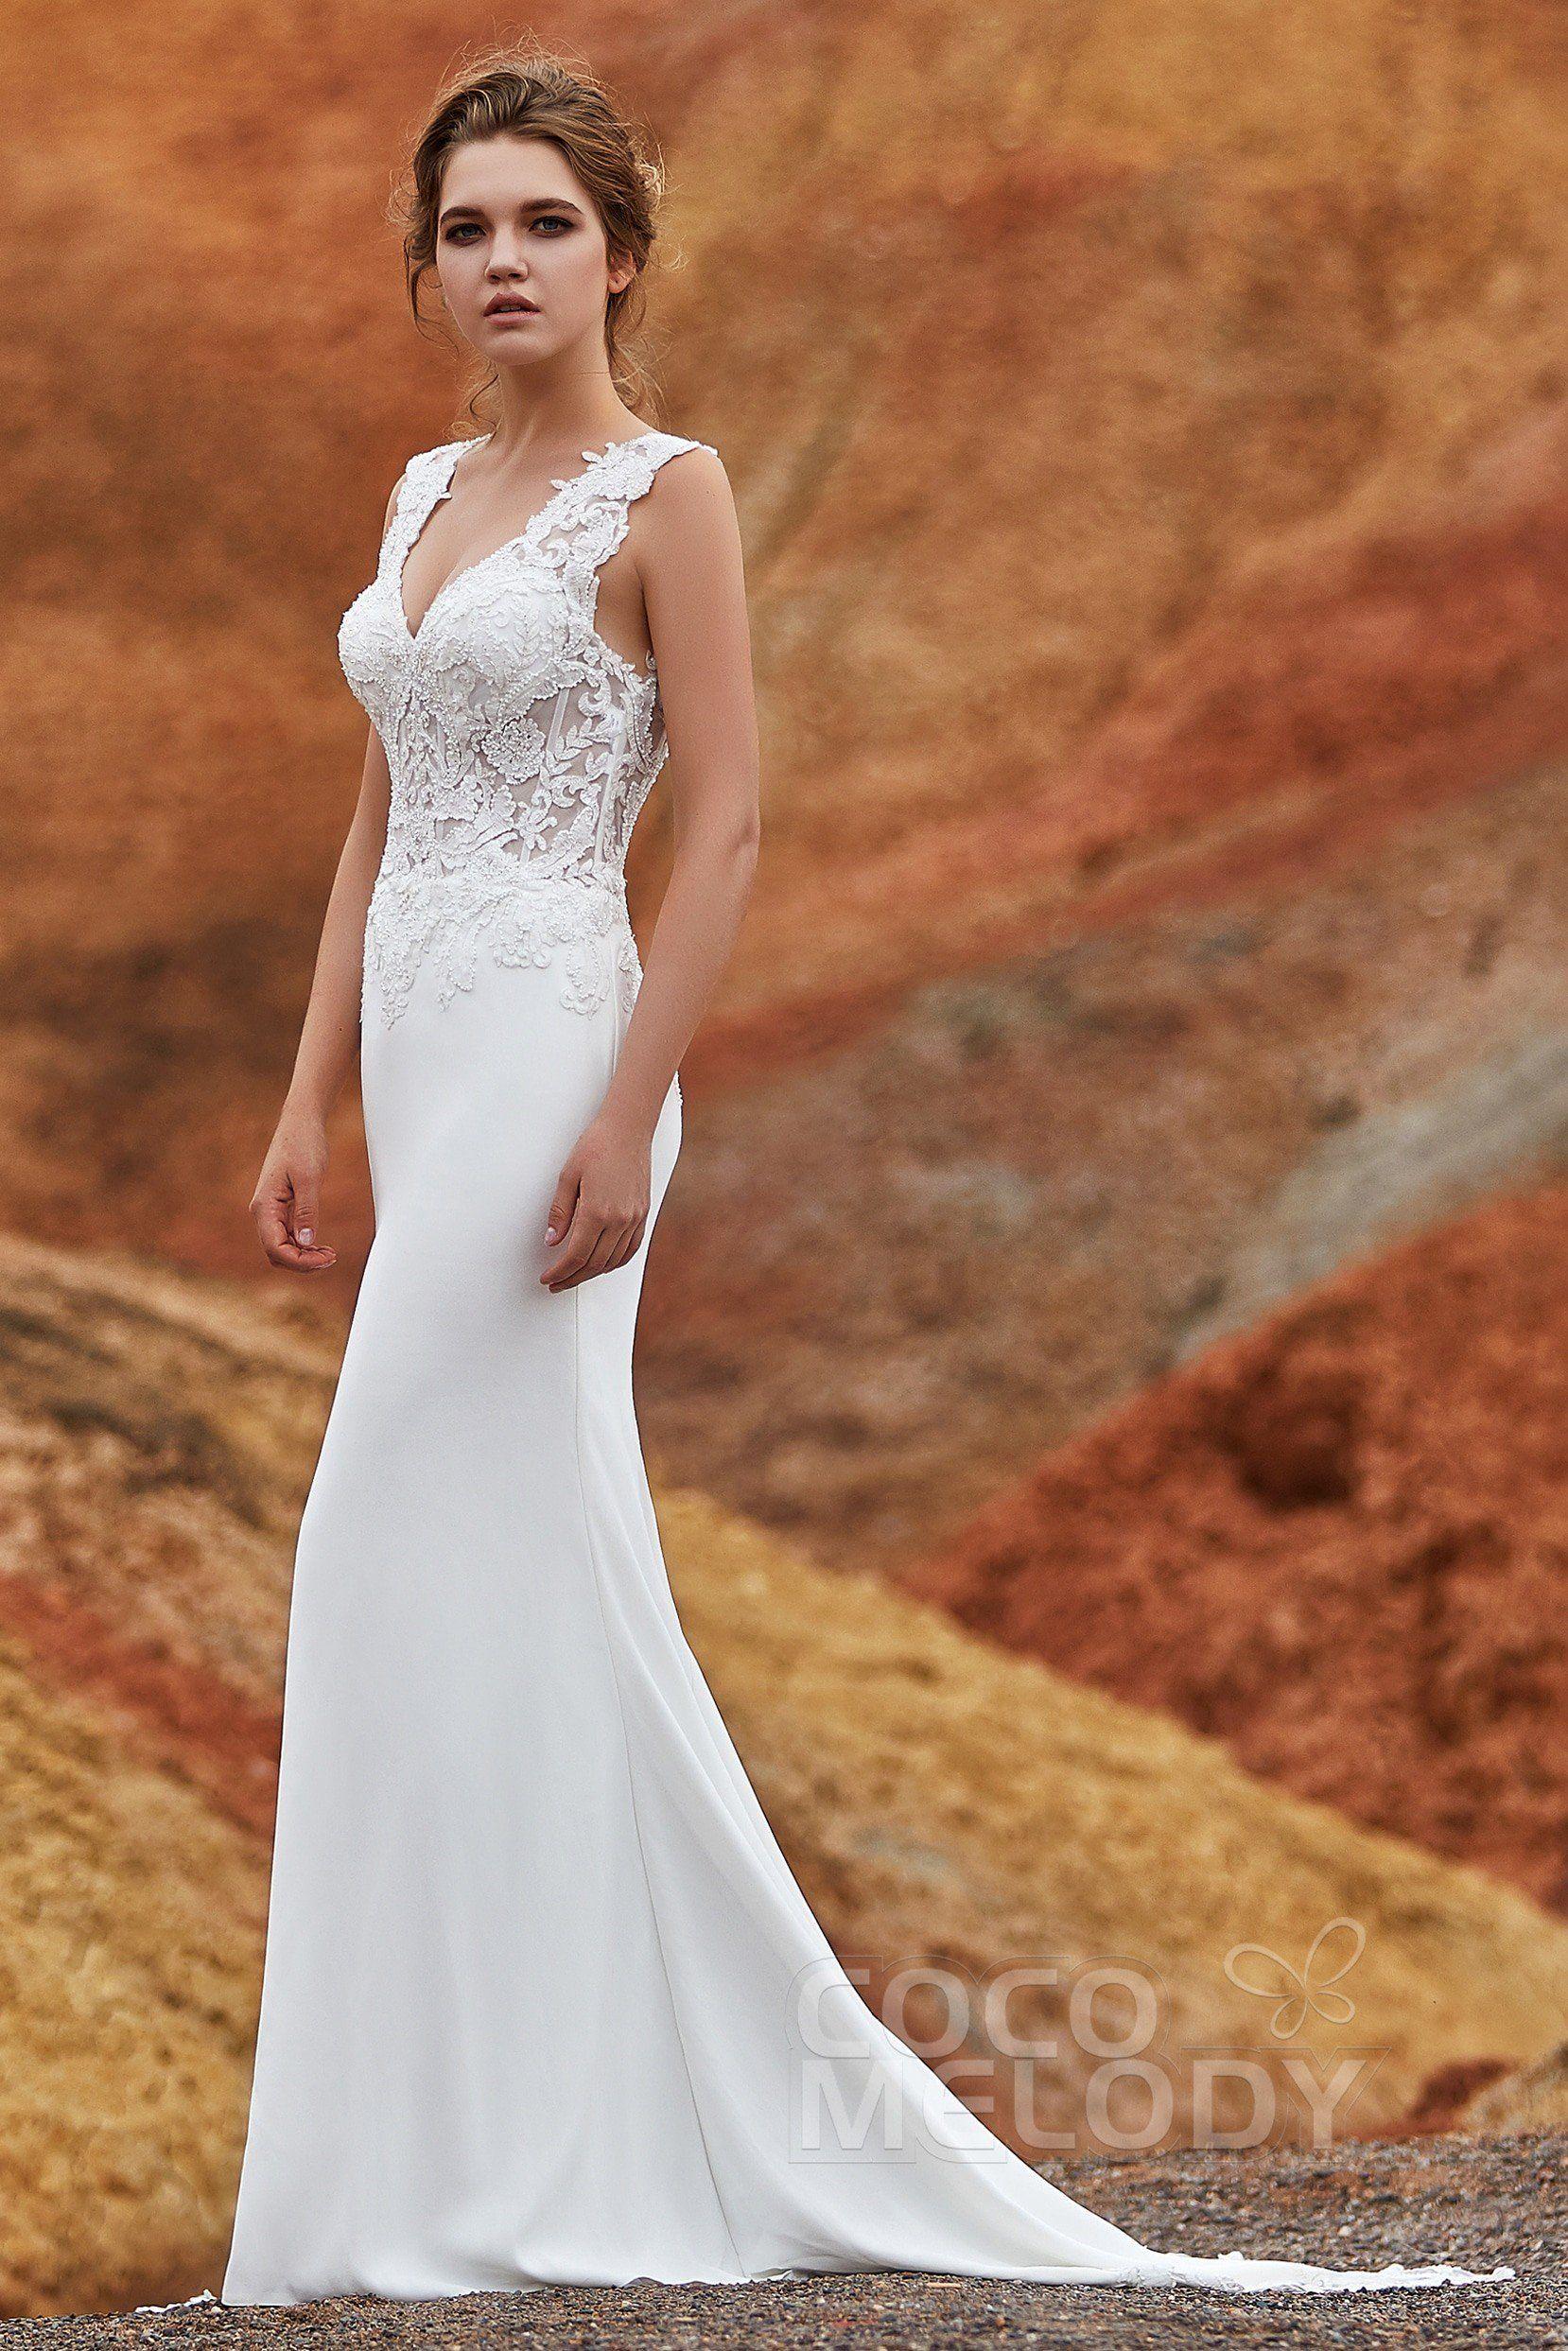 Mermaid Chapel Train Knitted Fabric Wedding Dress LD5816